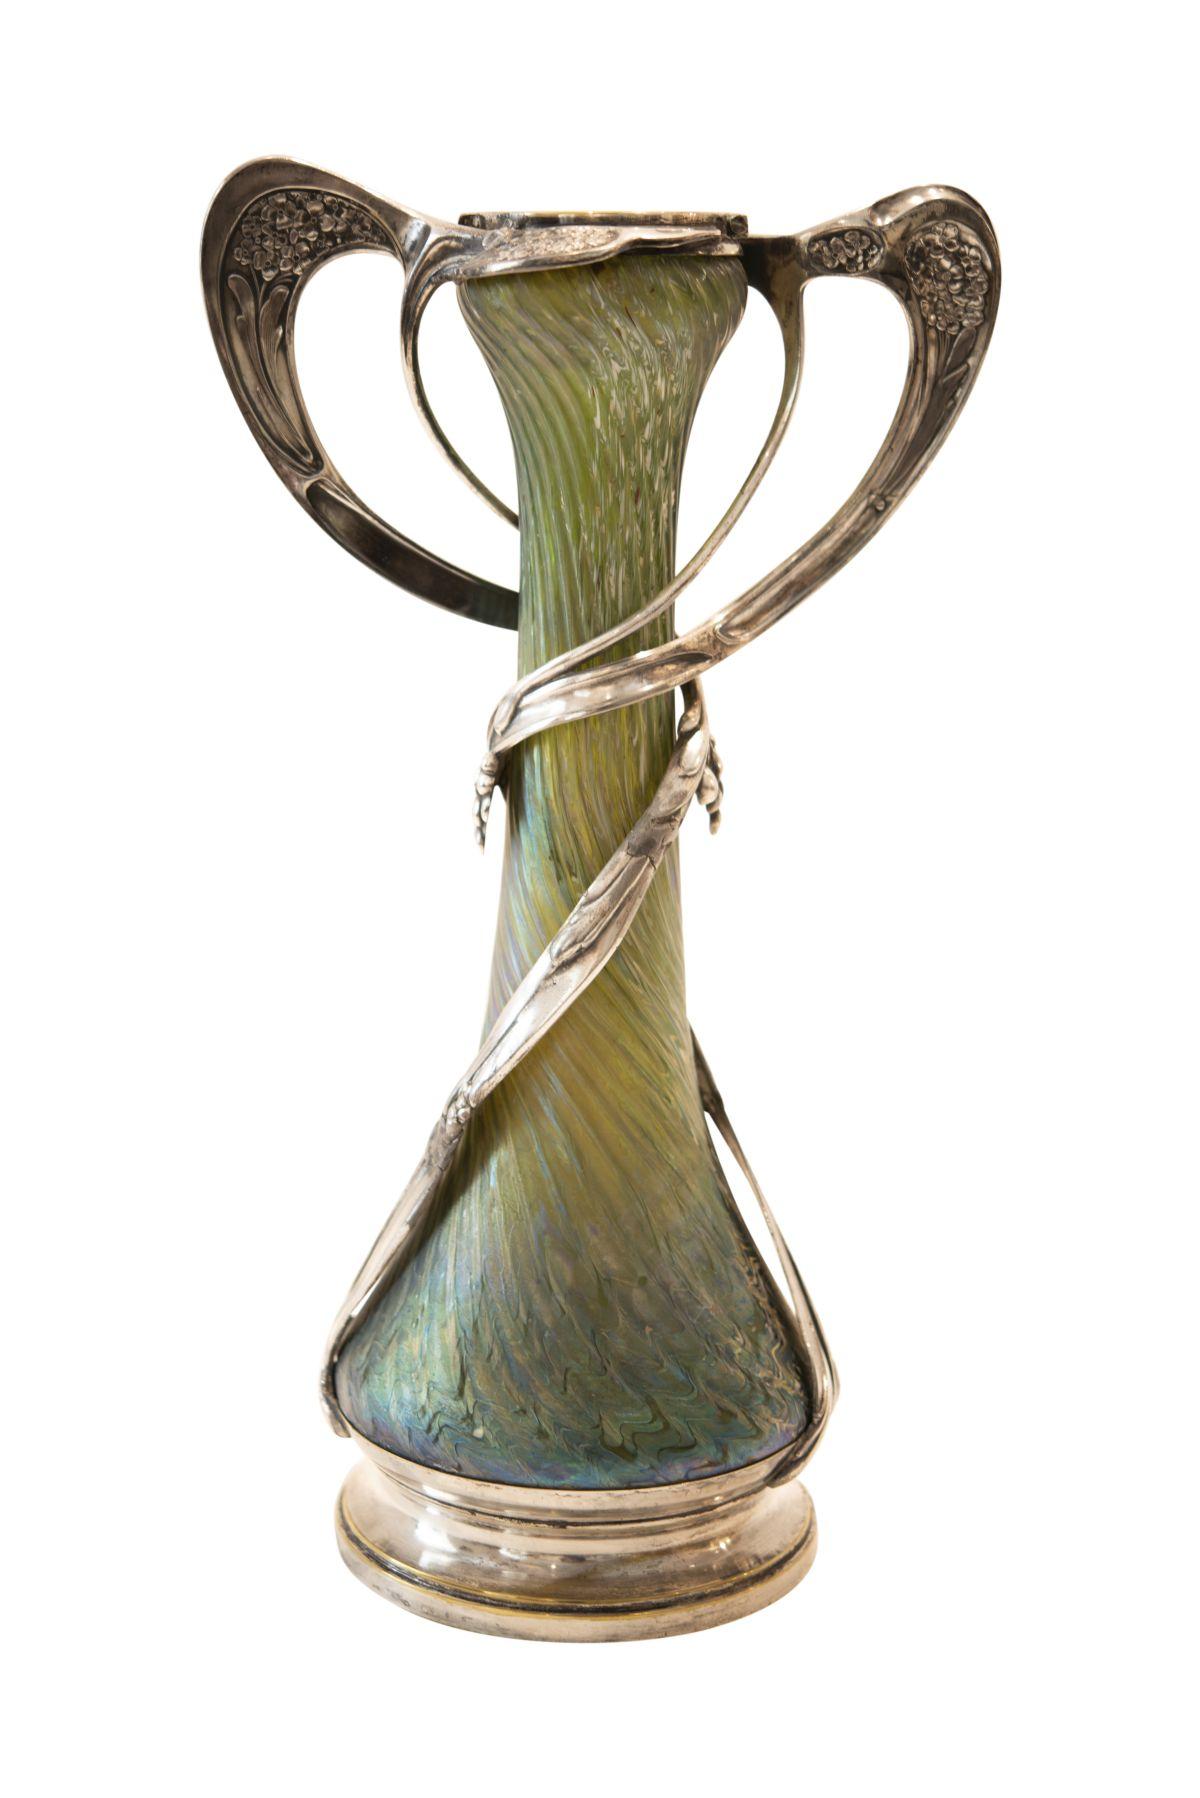 #185 Joh. Loetz Witwe, Vase with Elaborate Tin Mounting | Joh. Loetz Witwe, Vase mit aufwendiger Zinnmontierung Image